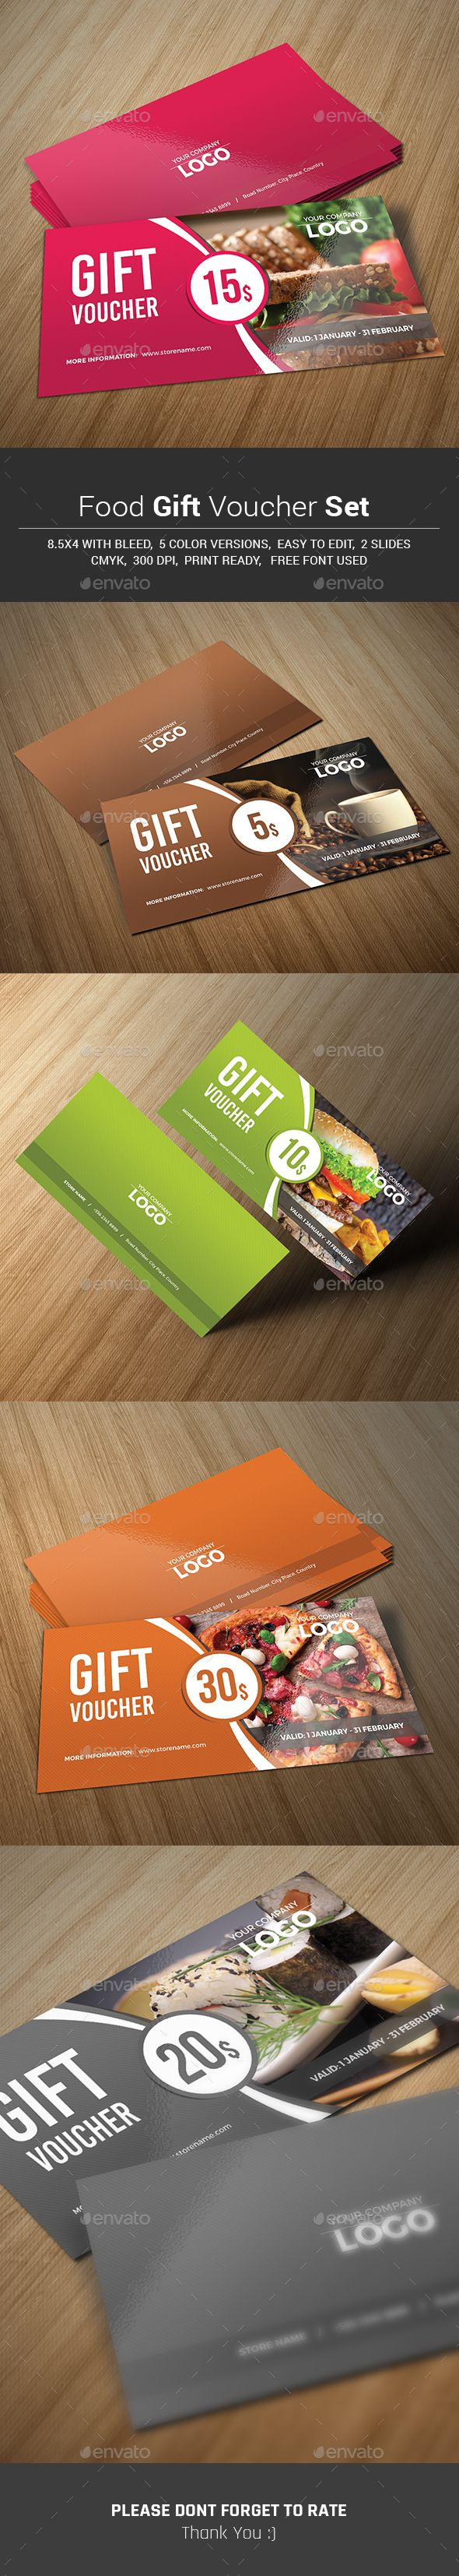 Food Gift Voucher Set Template PSD #design Download: http://graphicriver.net/item/food-gift-voucher-set/13993077?ref=ksioks